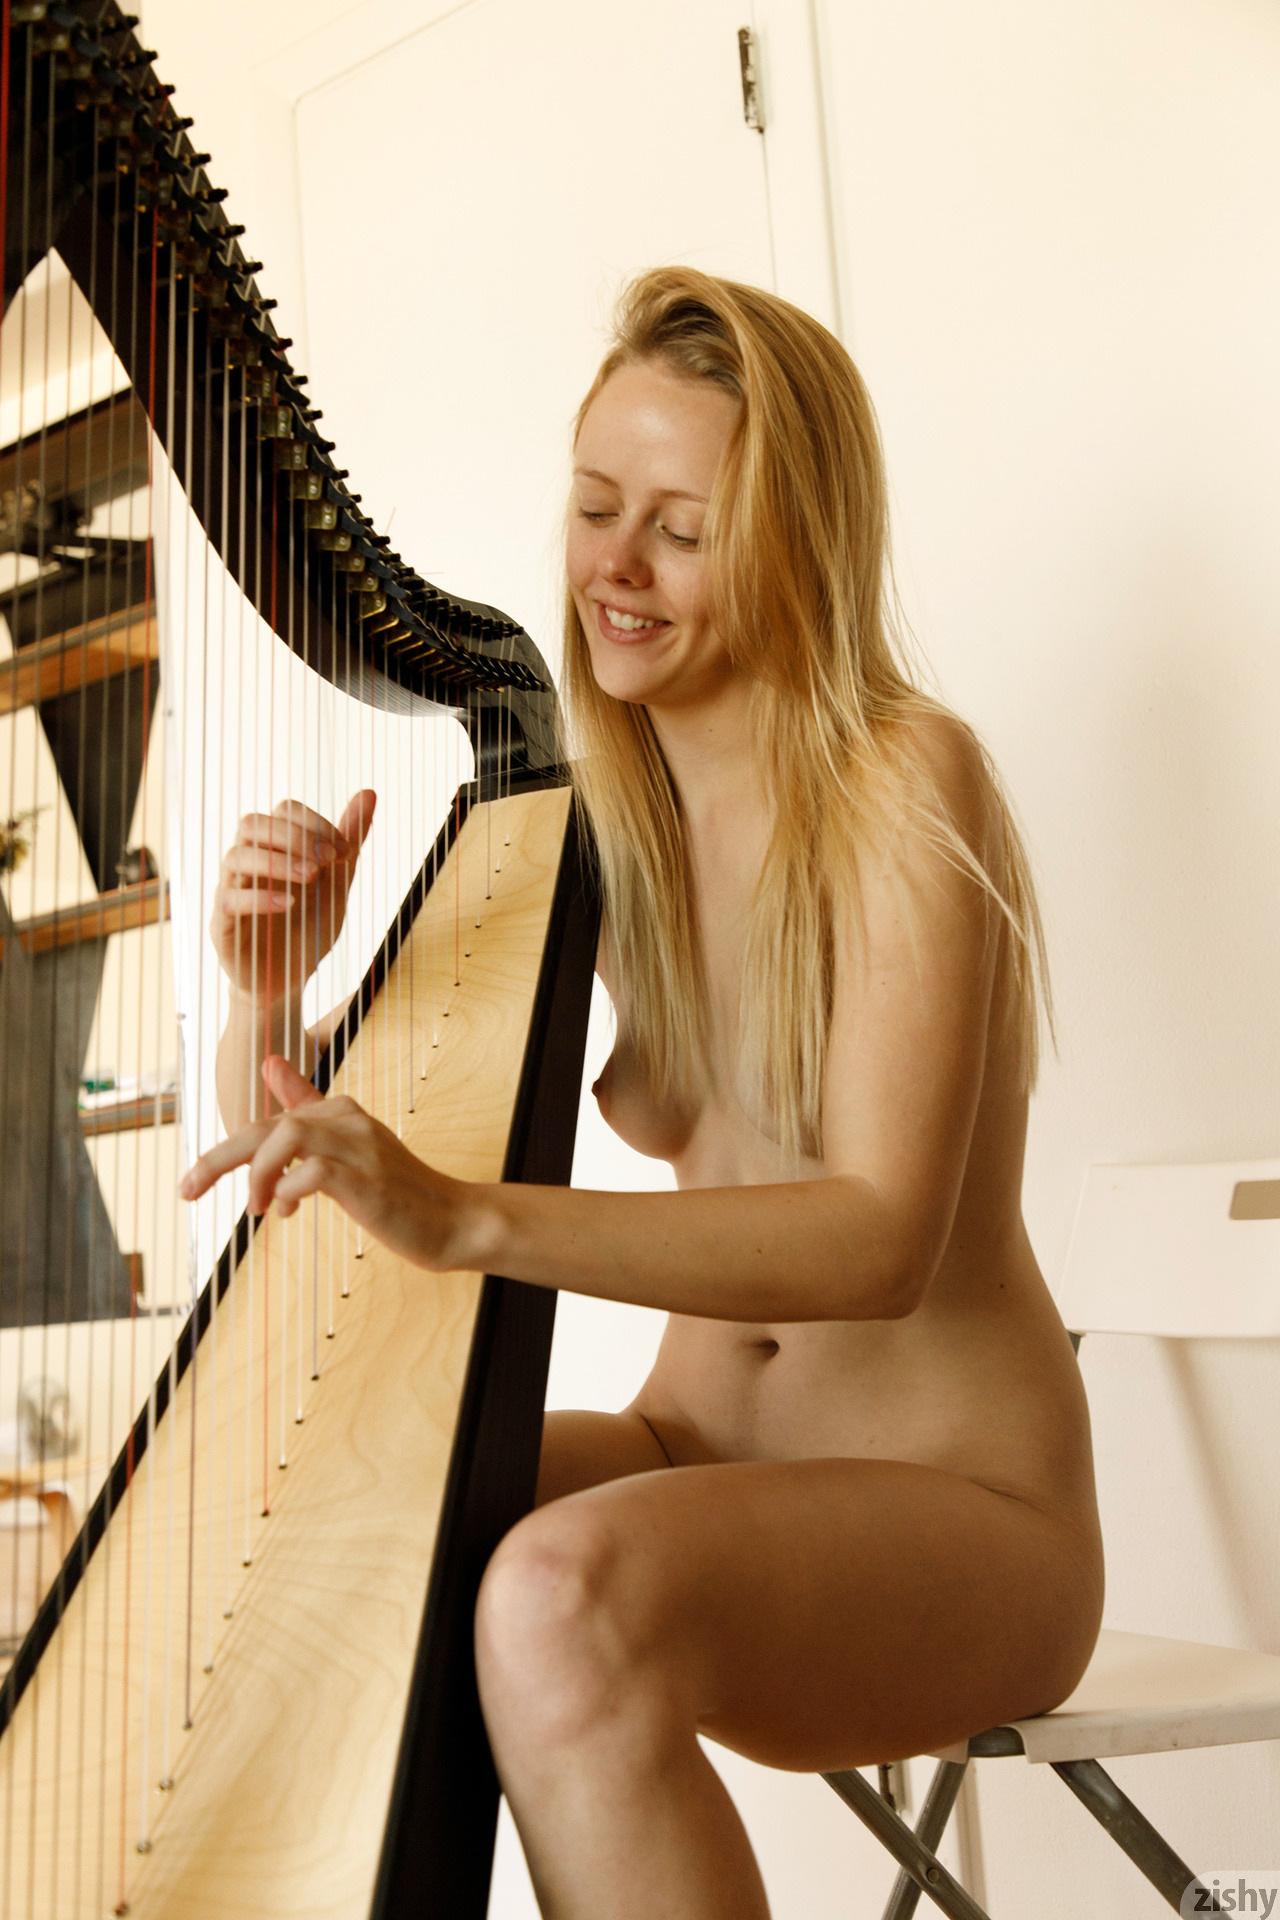 Helen Bergstrom Show Me Your Strings Zishy (13)